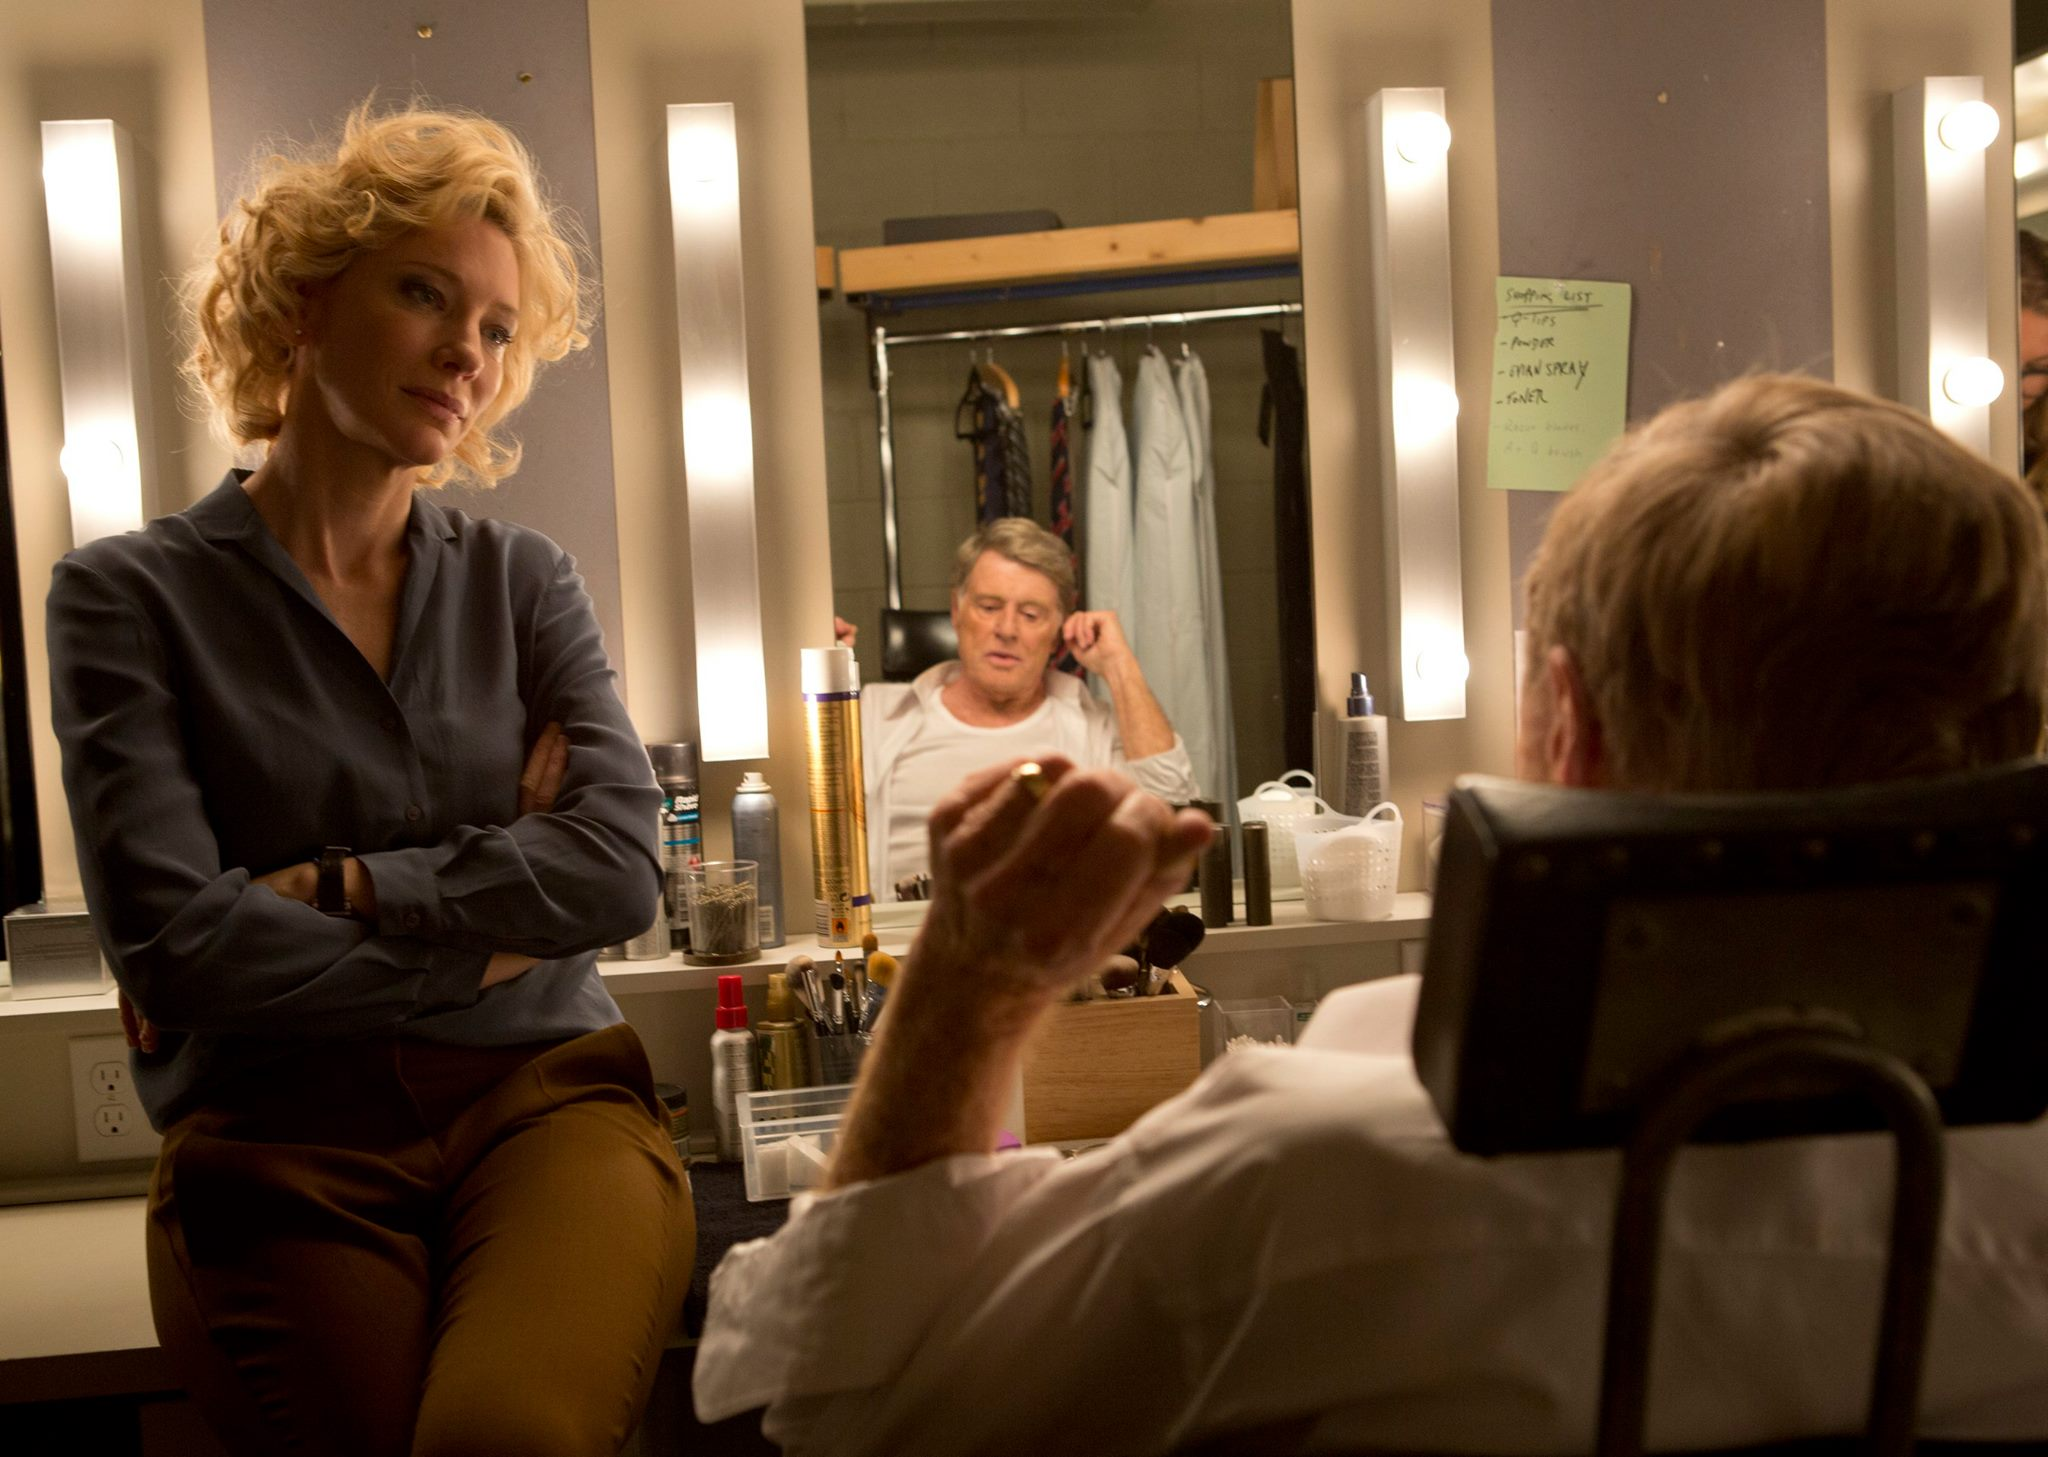 Still of Robert Redford and Cate Blanchett in Truth.